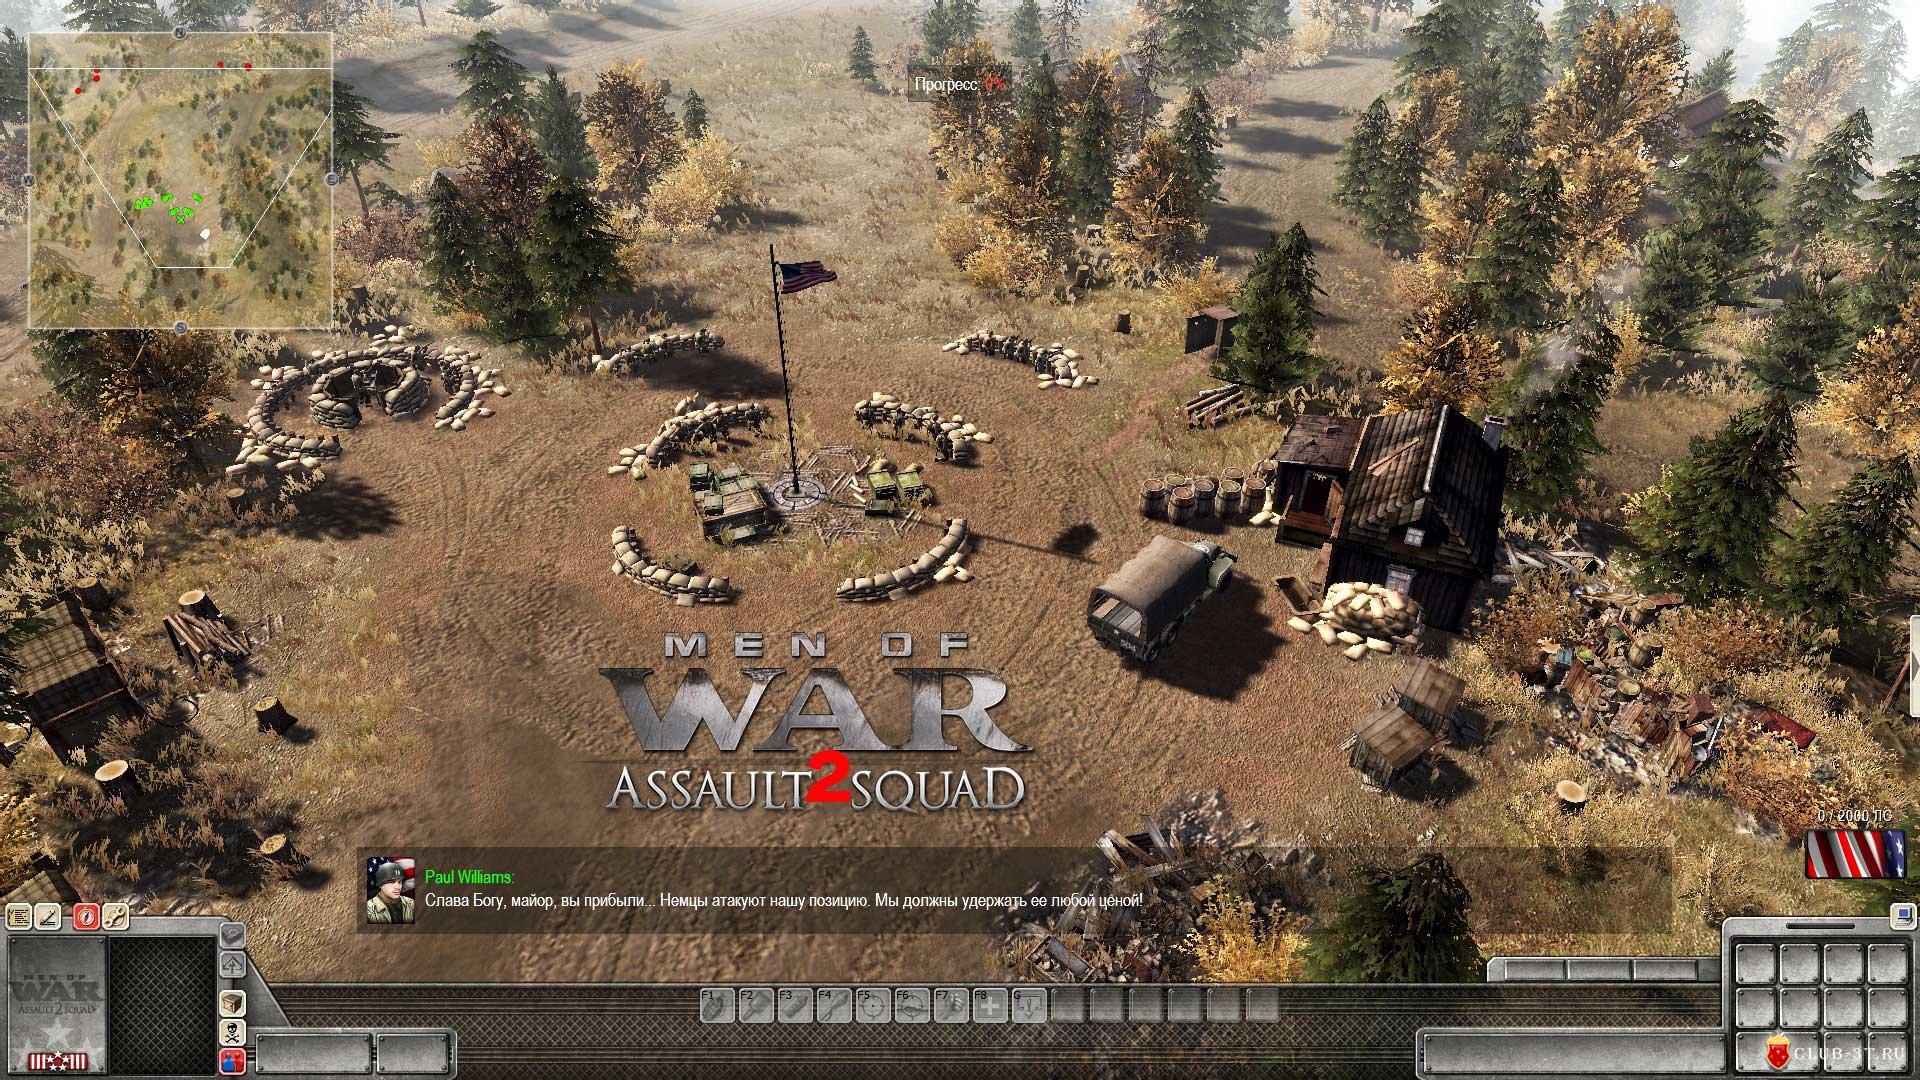 Men of war assault squad 2 cold war mod - 725